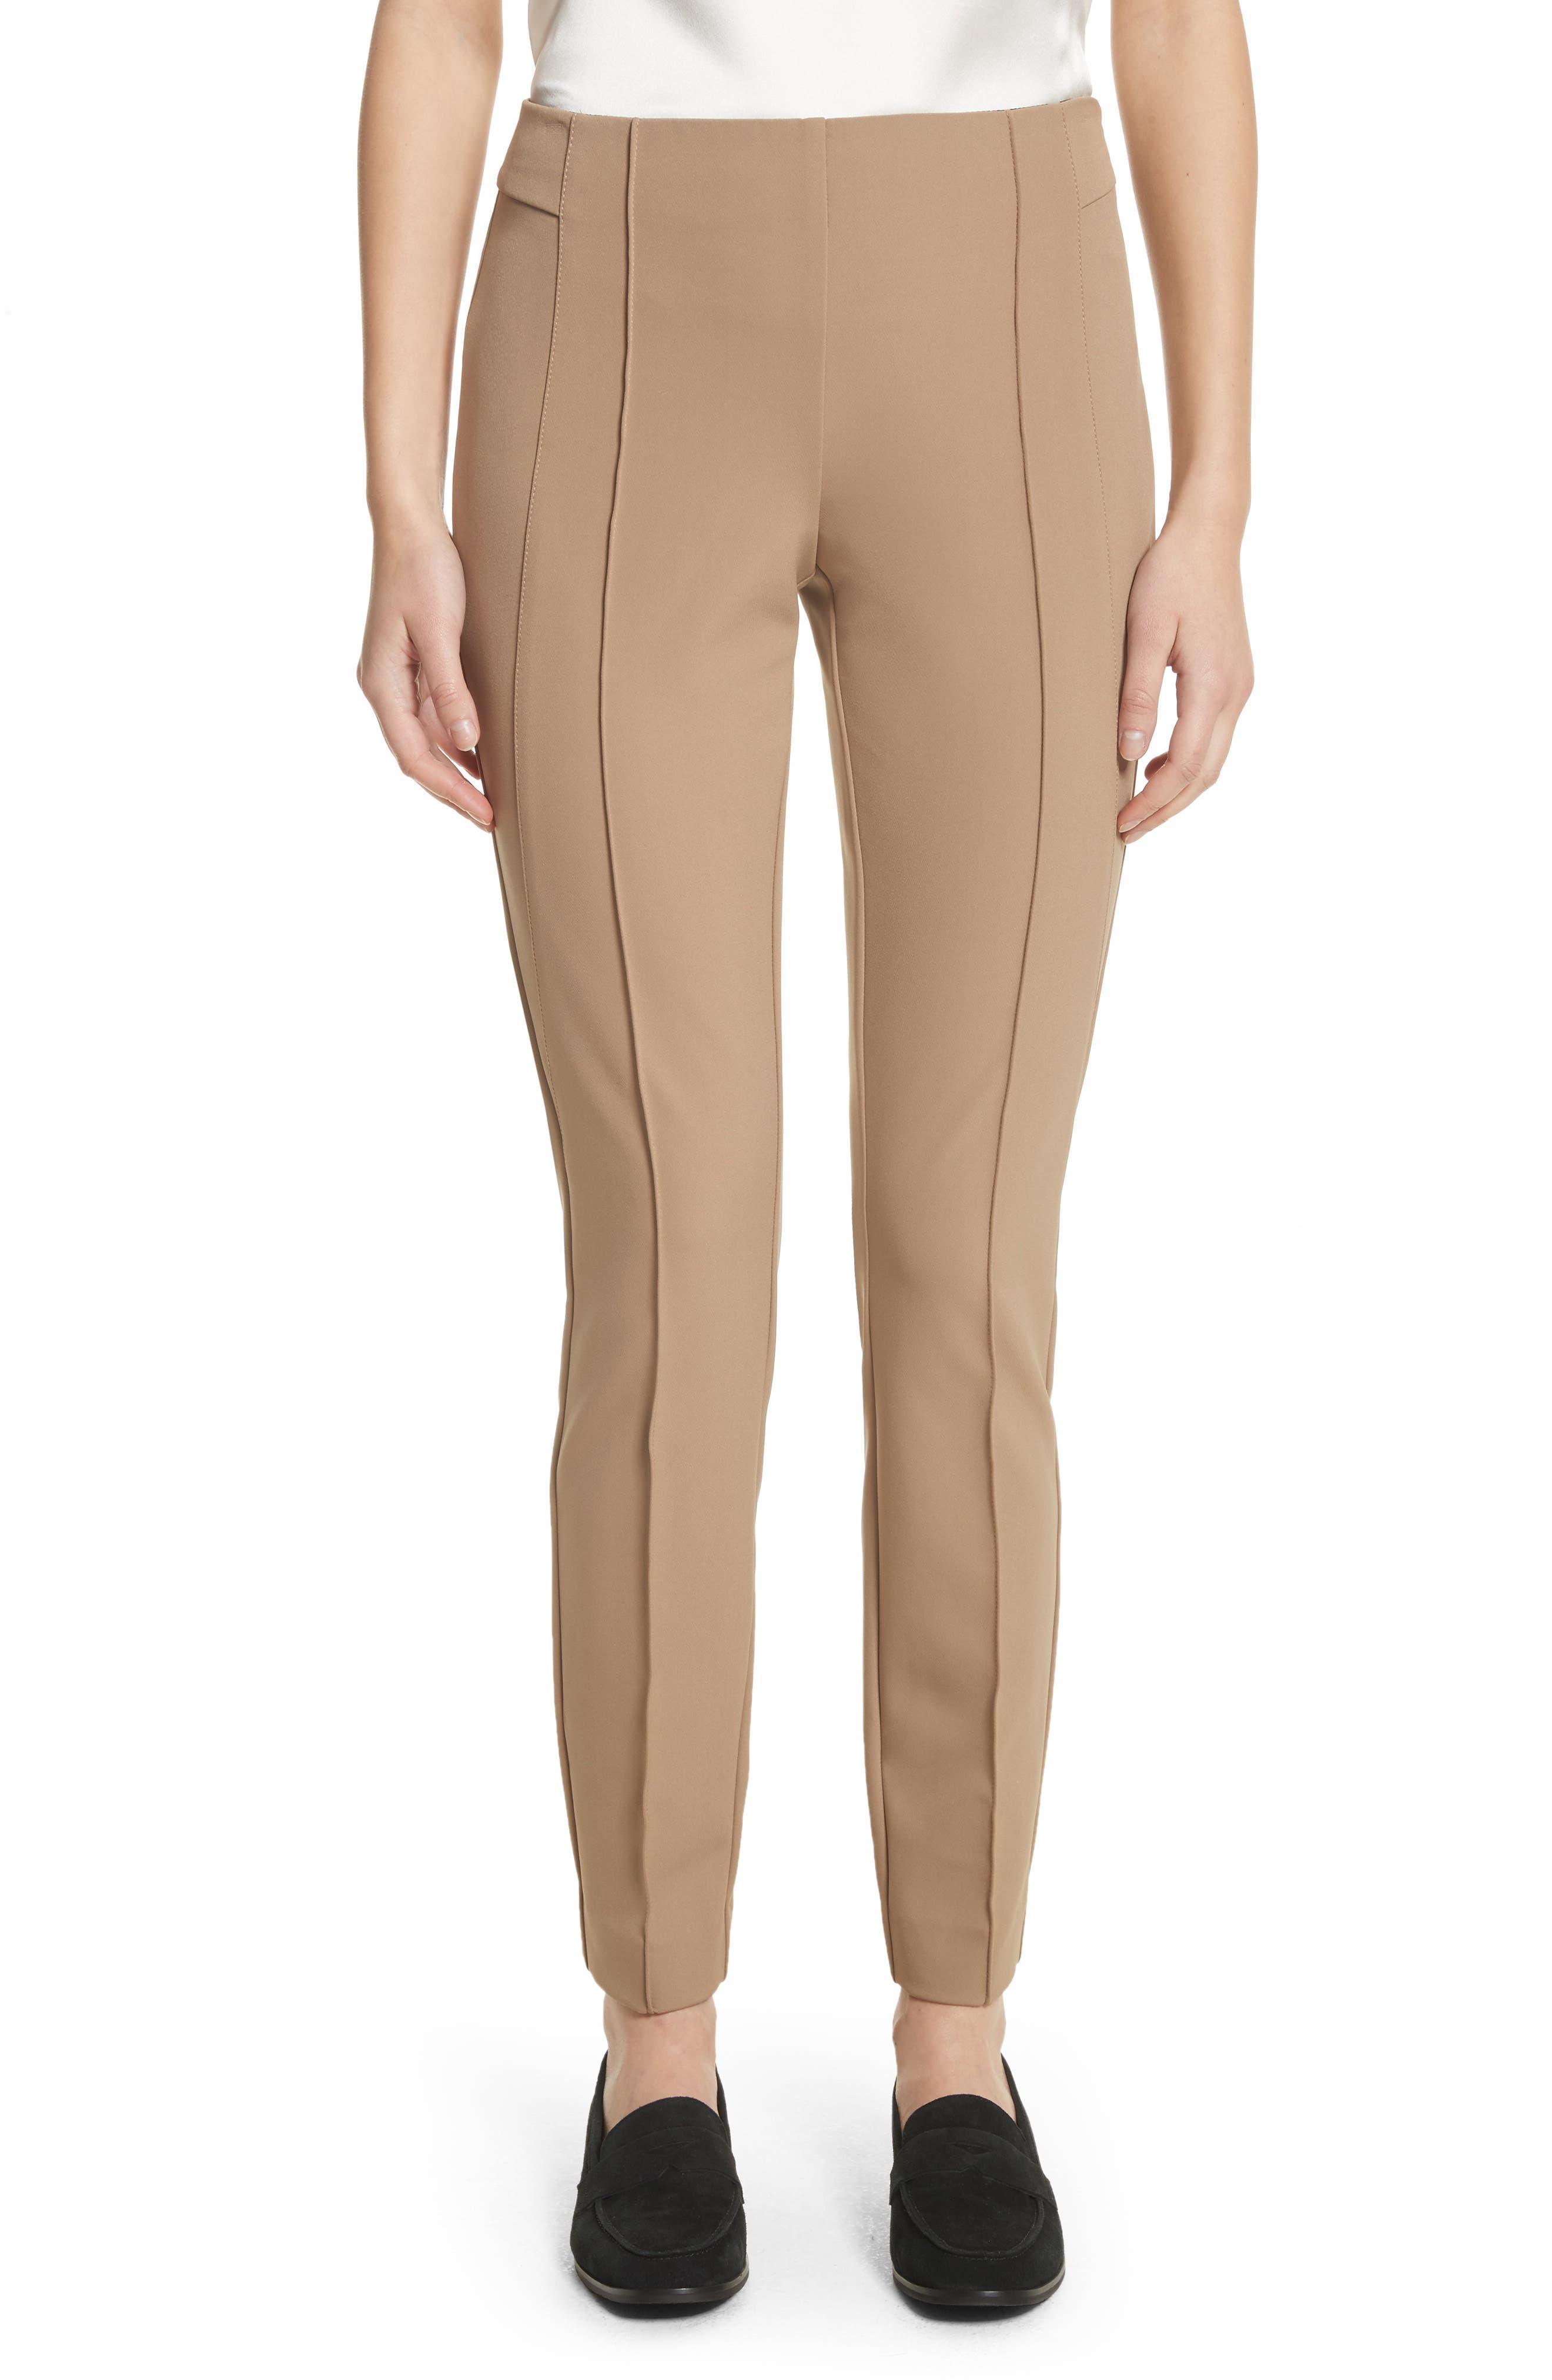 Main Image - Lafayette 148 New York 'Gramercy' Acclaimed Stretch Pants (Regular & Petite)